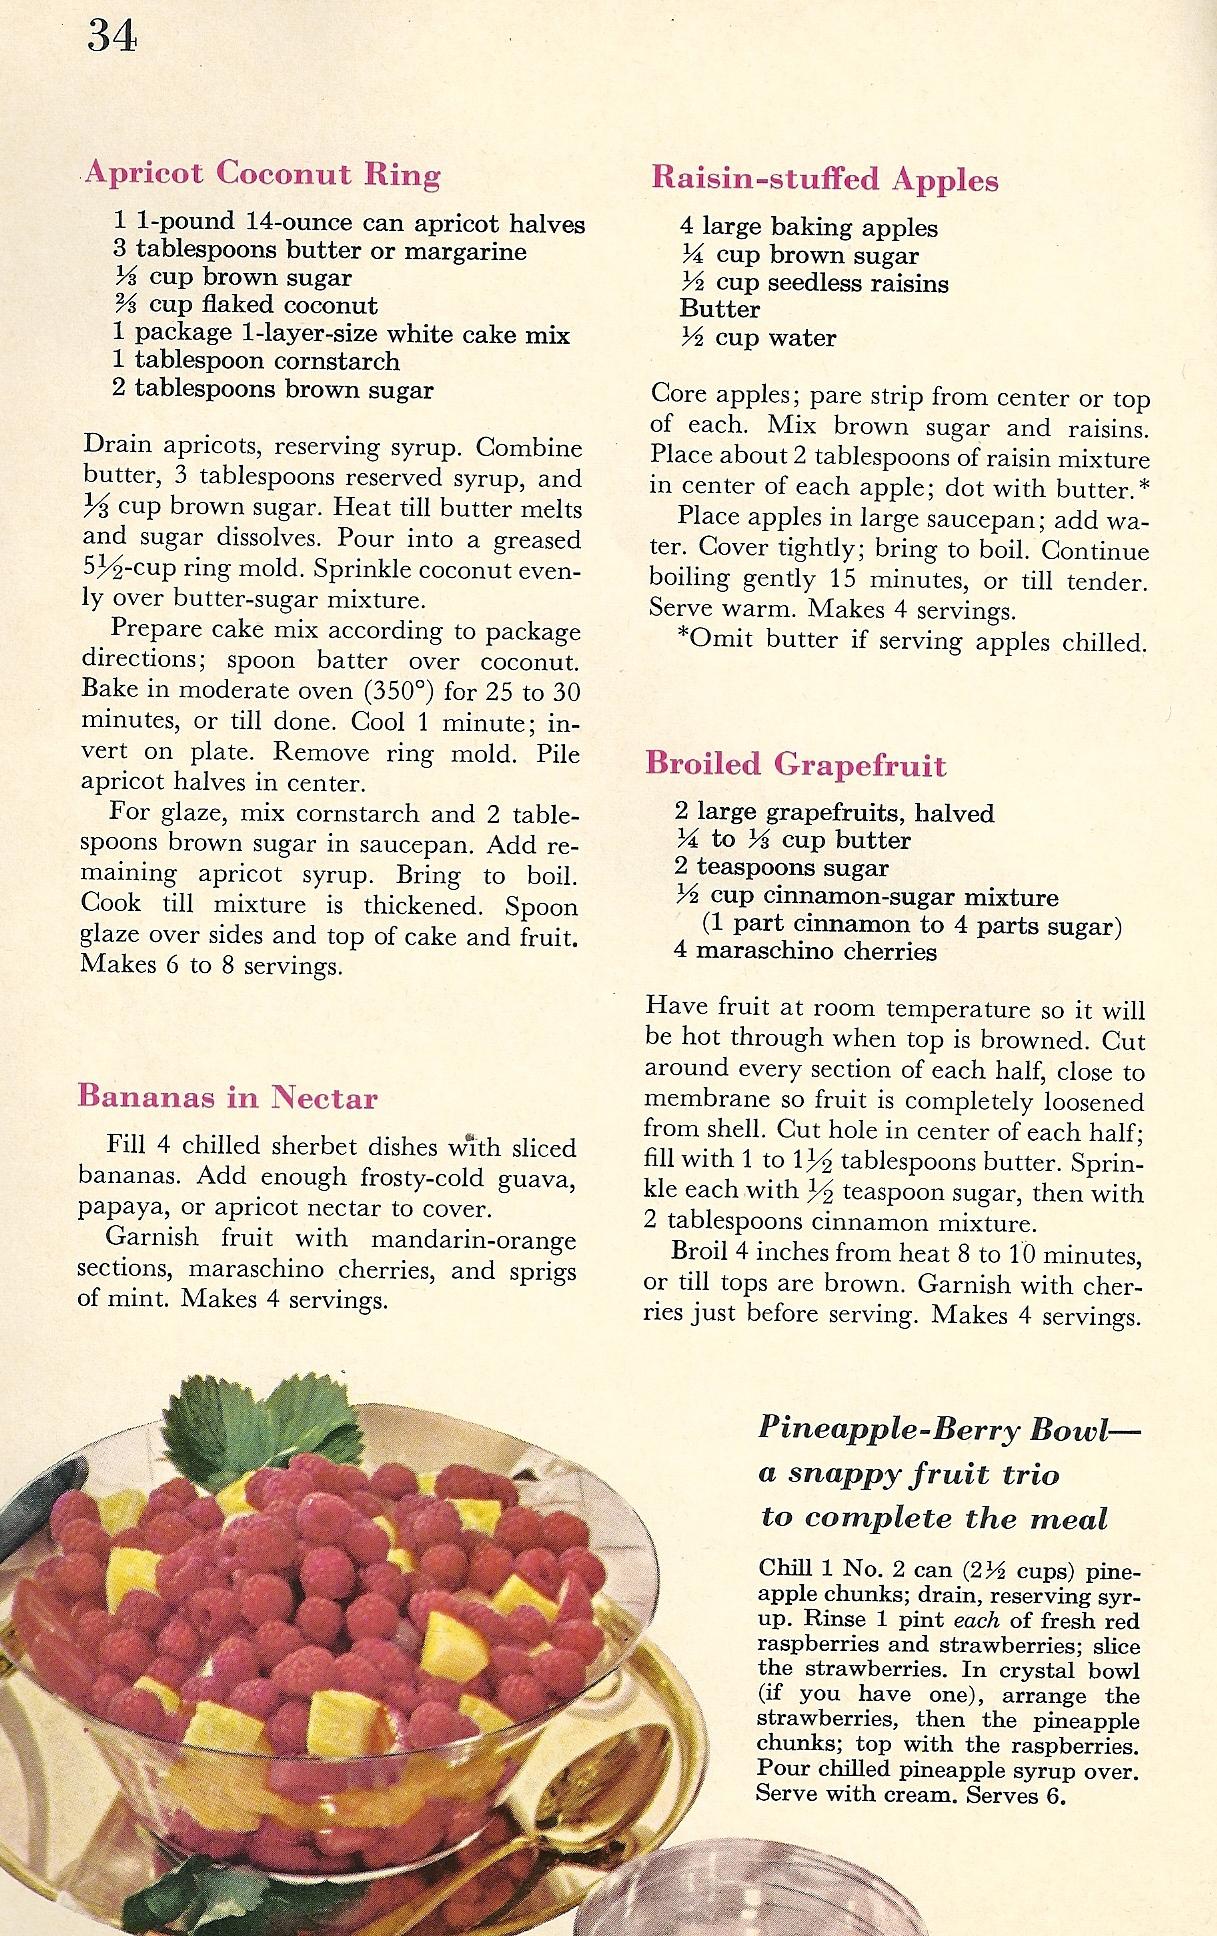 Vintage Recipes 1960s Desserts 7 |